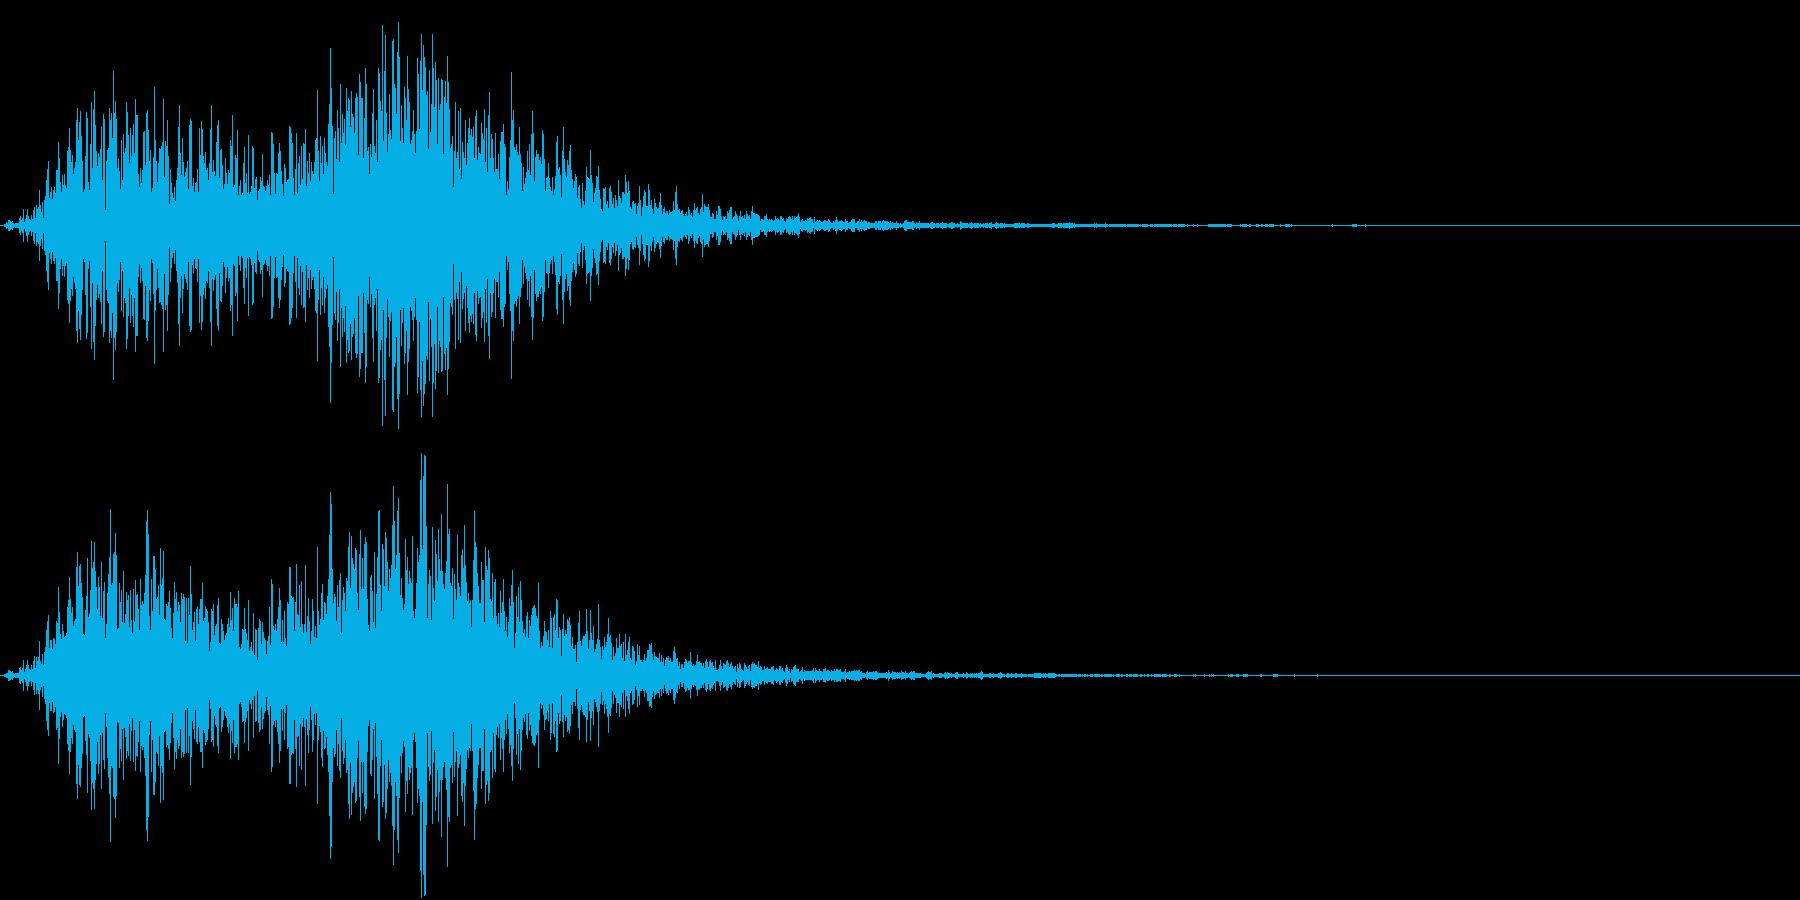 Battle 戦闘エフェクト音 4の再生済みの波形